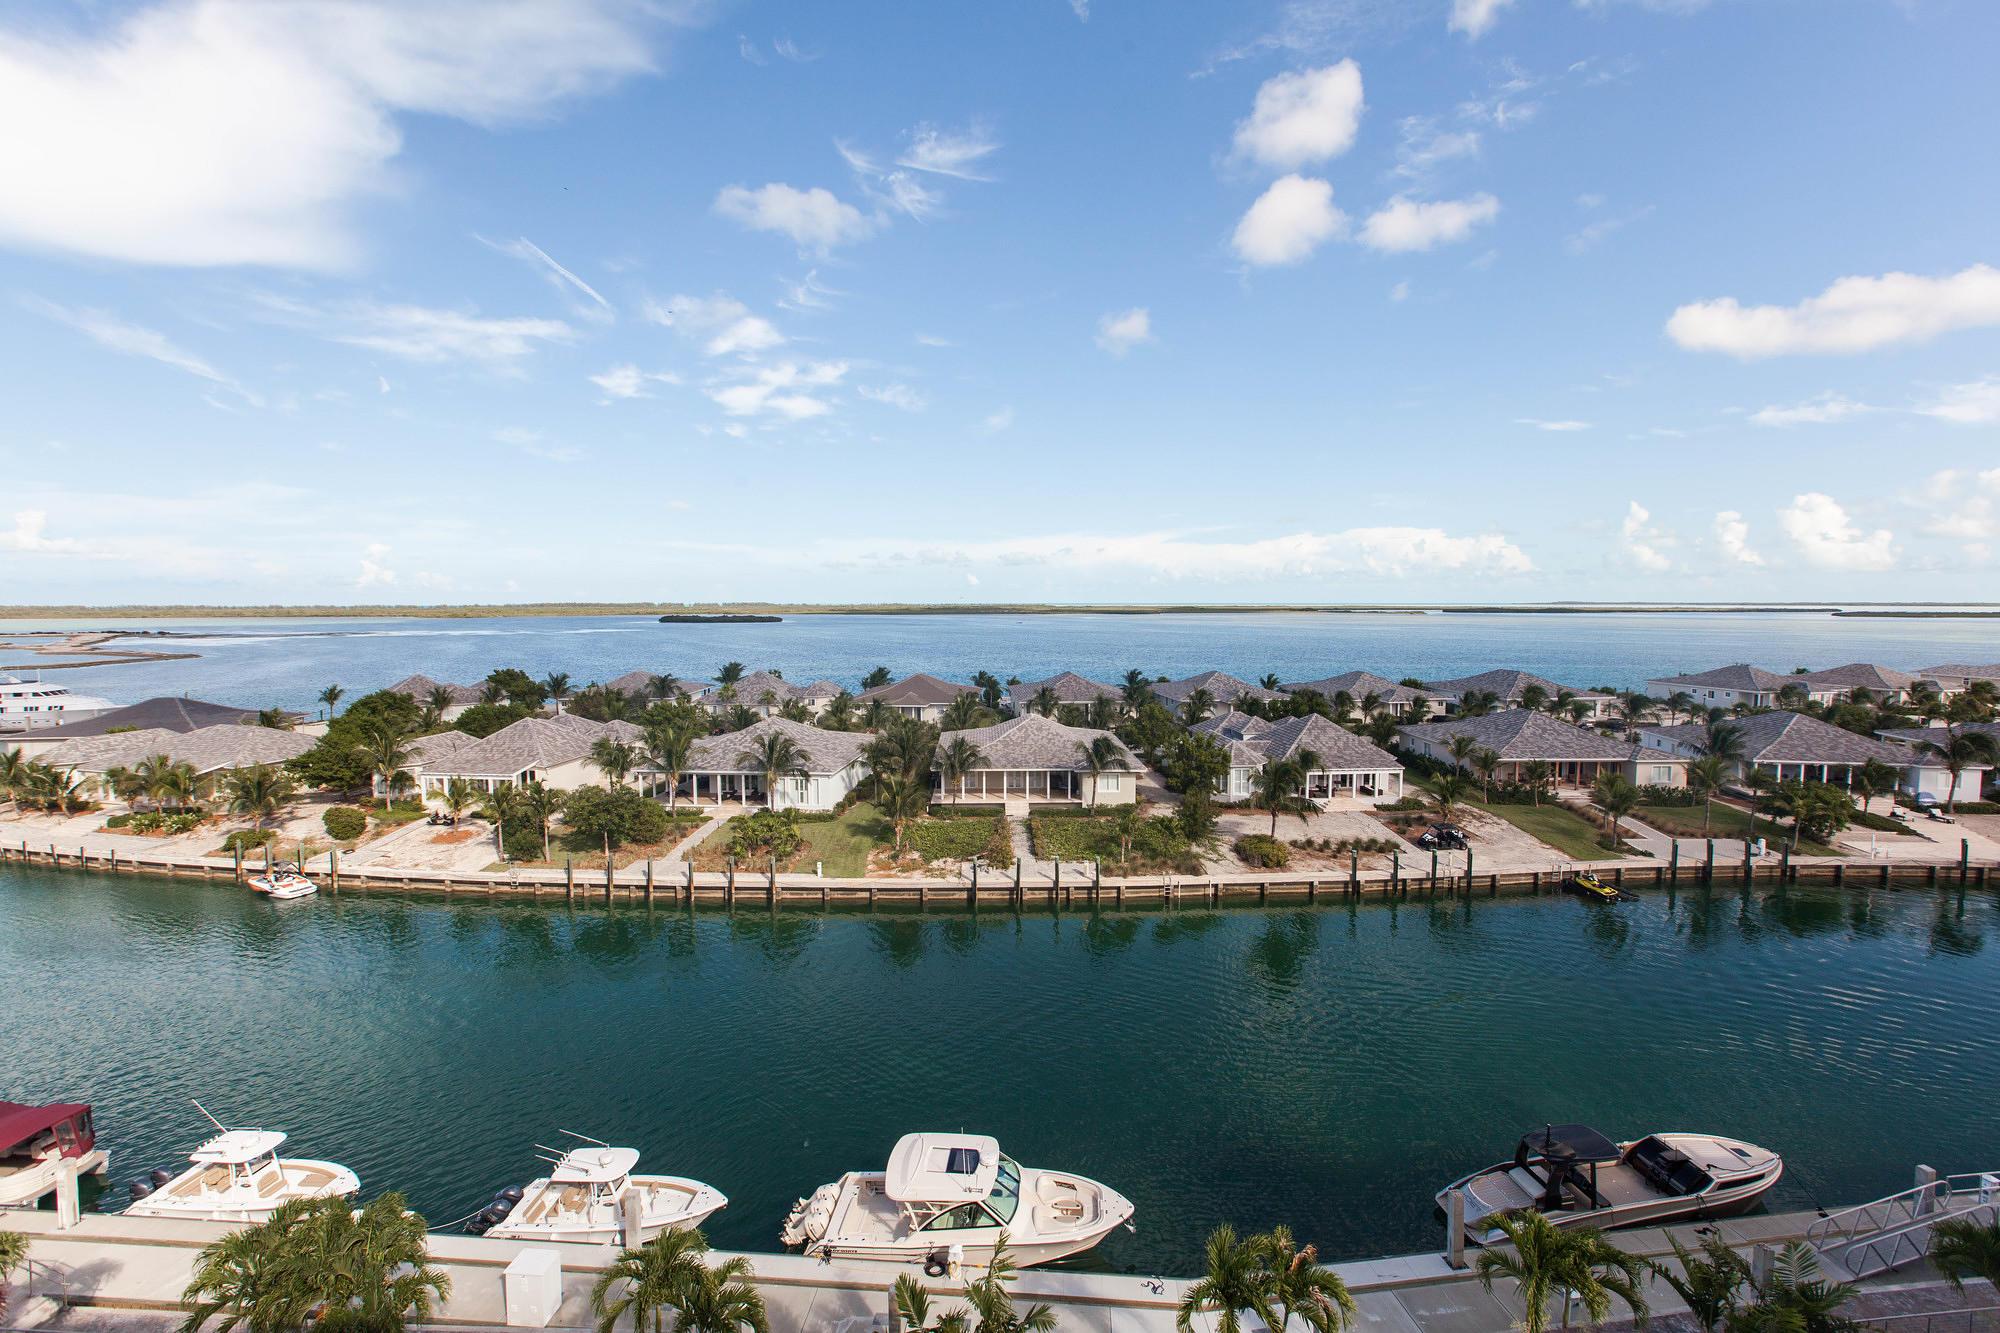 Relaxation Area at Hilton at Resorts World Bimini